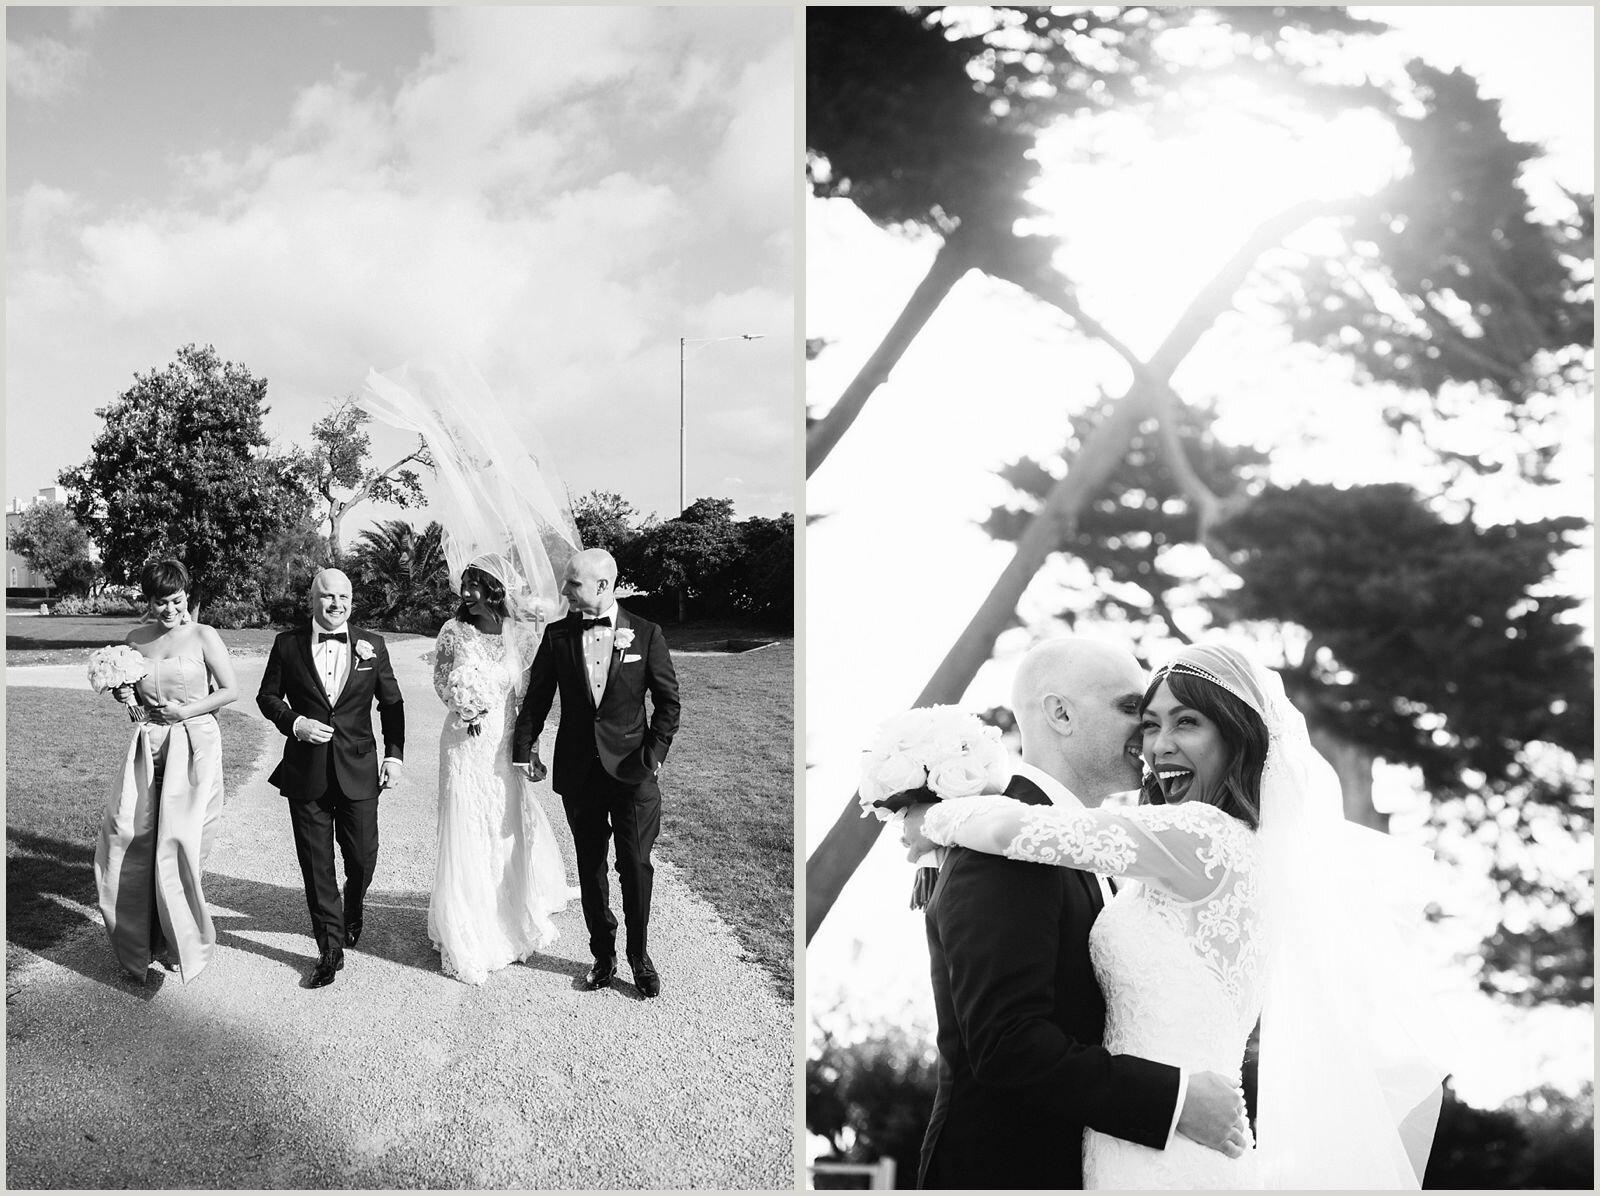 joseph_koprek_wedding_melbourne_the_prince_deck_0029.jpg